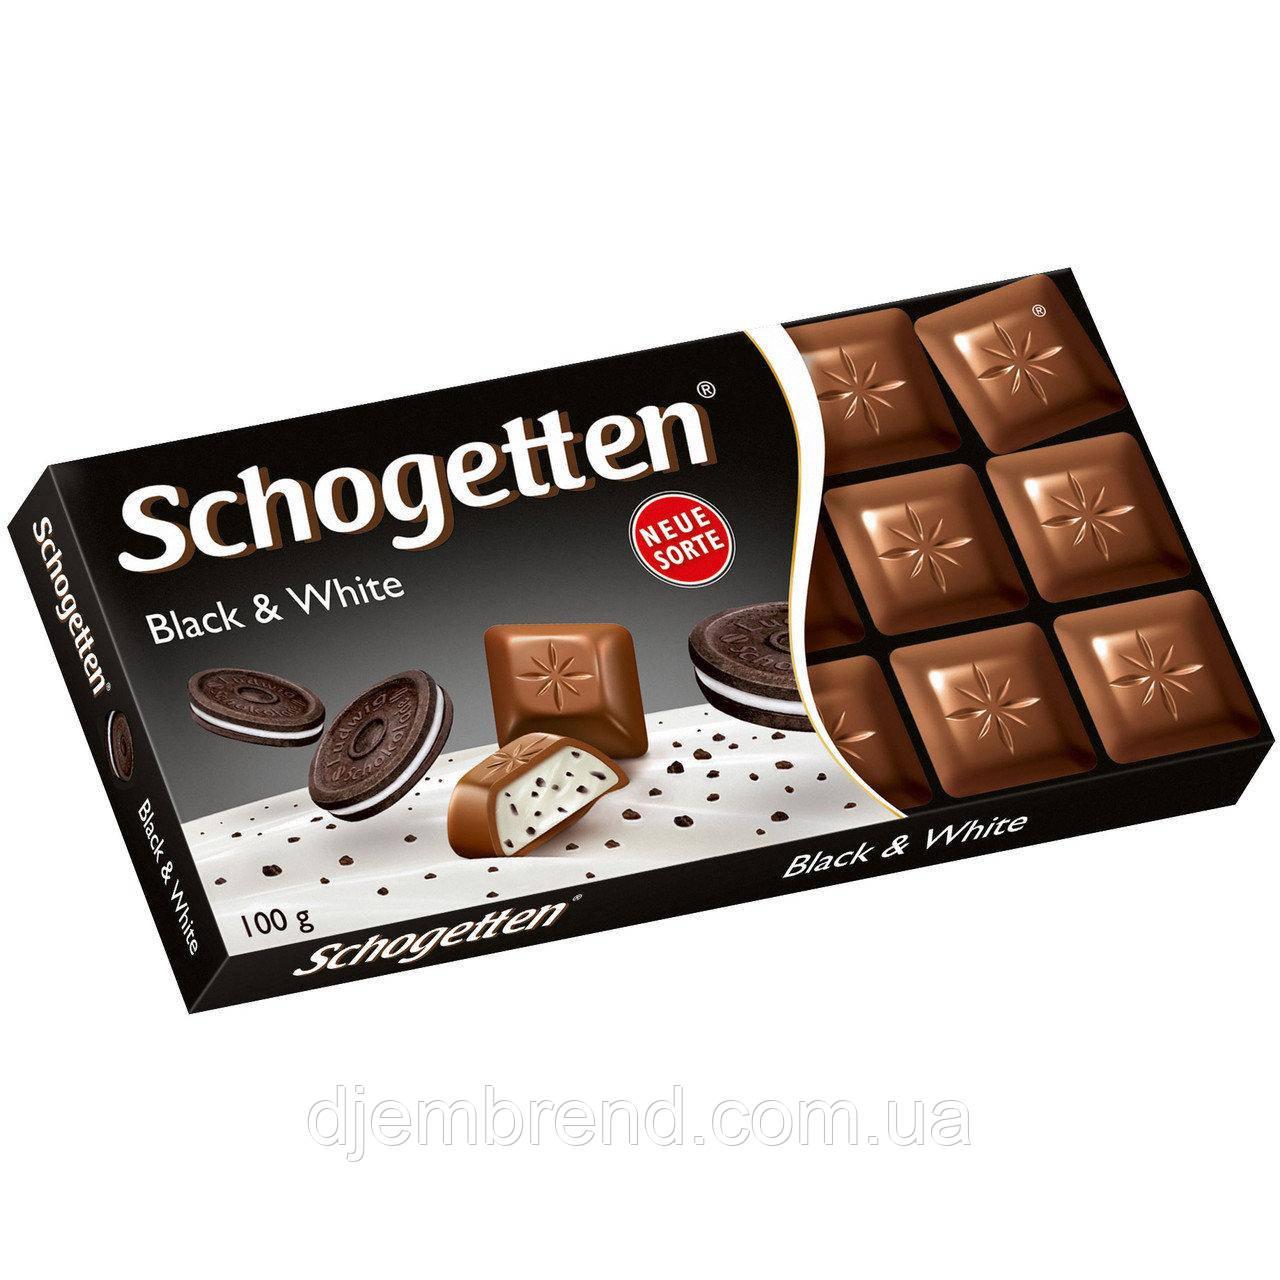 Шоколад черное и белое с печеньем «Орео» Schogetten Black and White 100 г